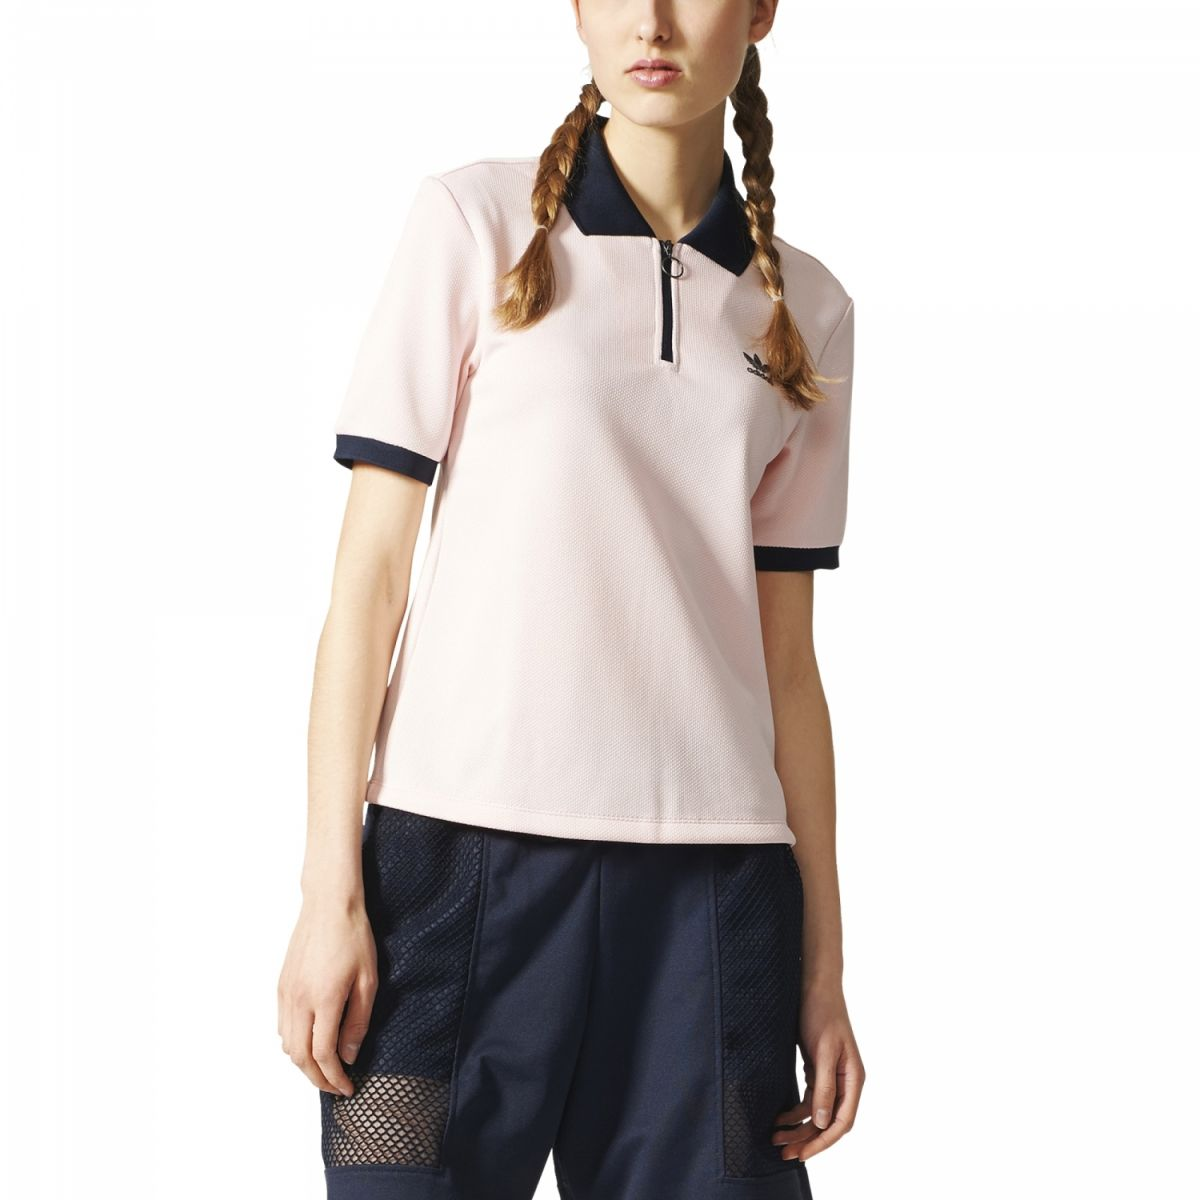 adidas originals osaka polo shirt damen rosa bq5740 sport klingenmaier. Black Bedroom Furniture Sets. Home Design Ideas